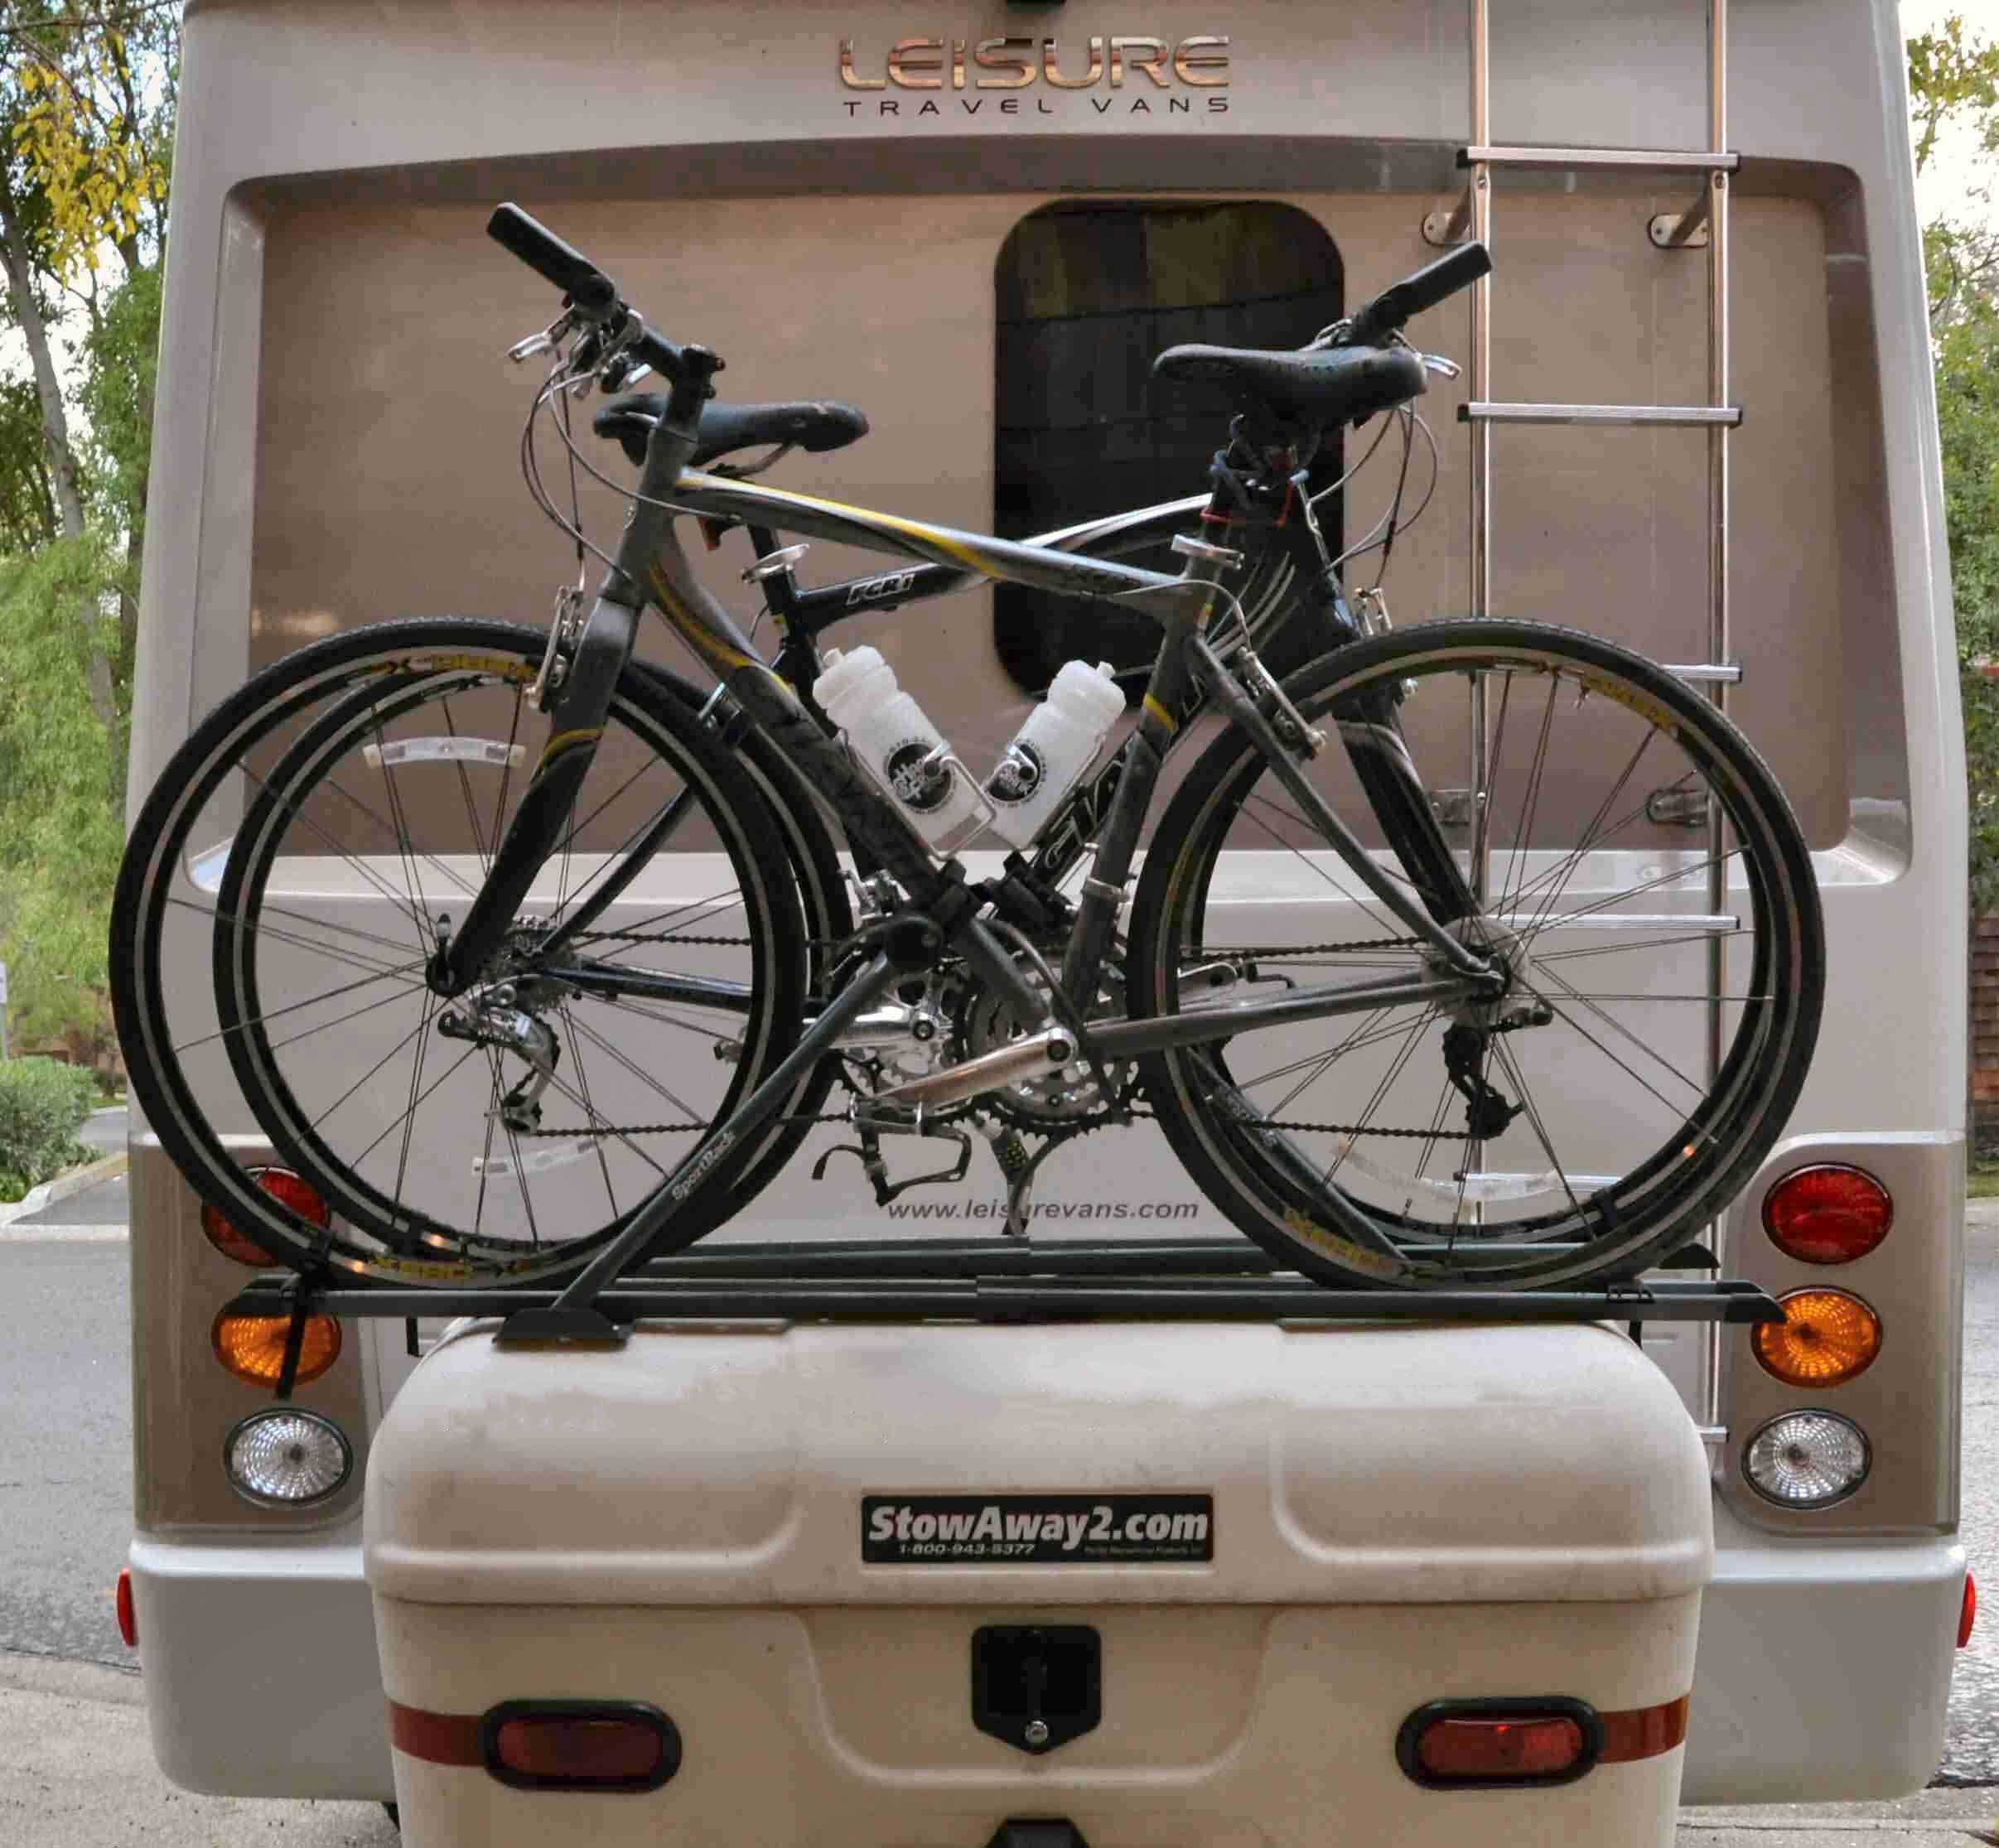 Bike Rack Options